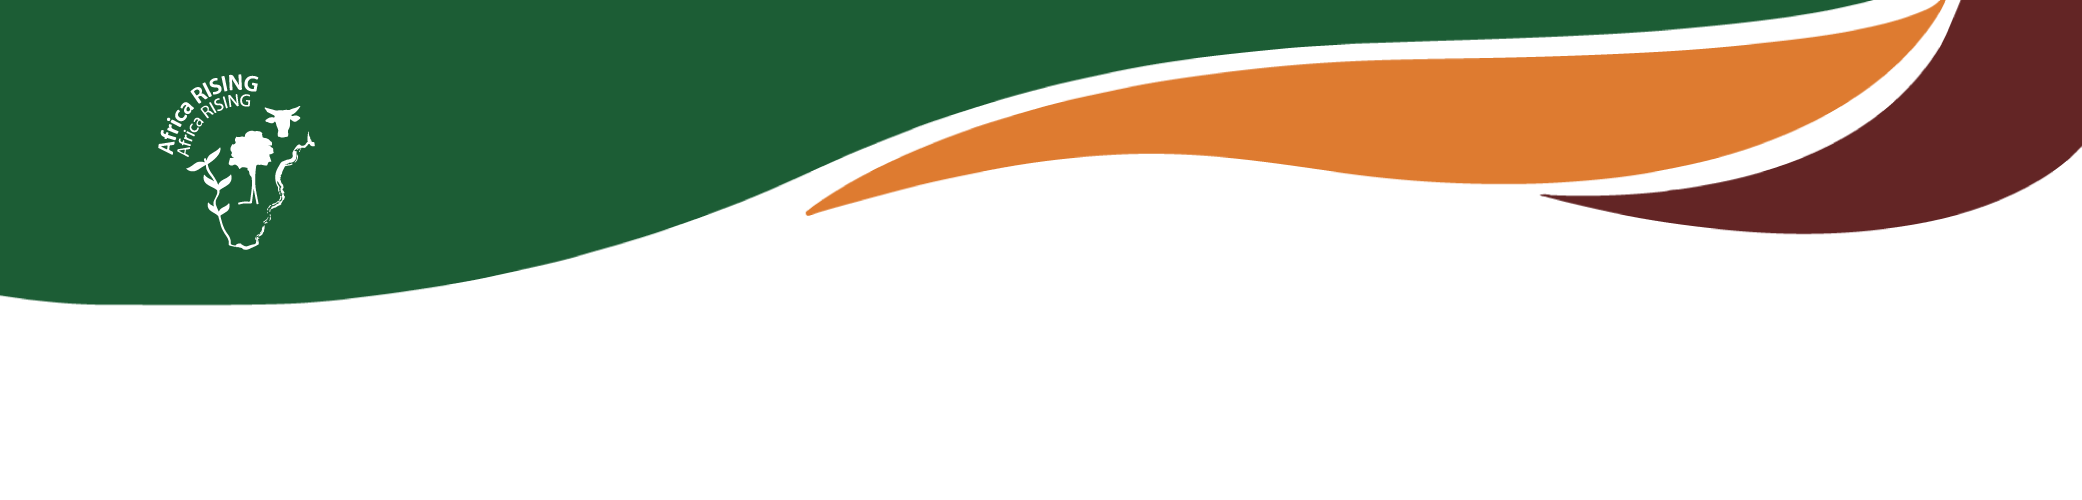 https://africa-rising.net/wp-content/uploads/2019/03/banner-sample.png